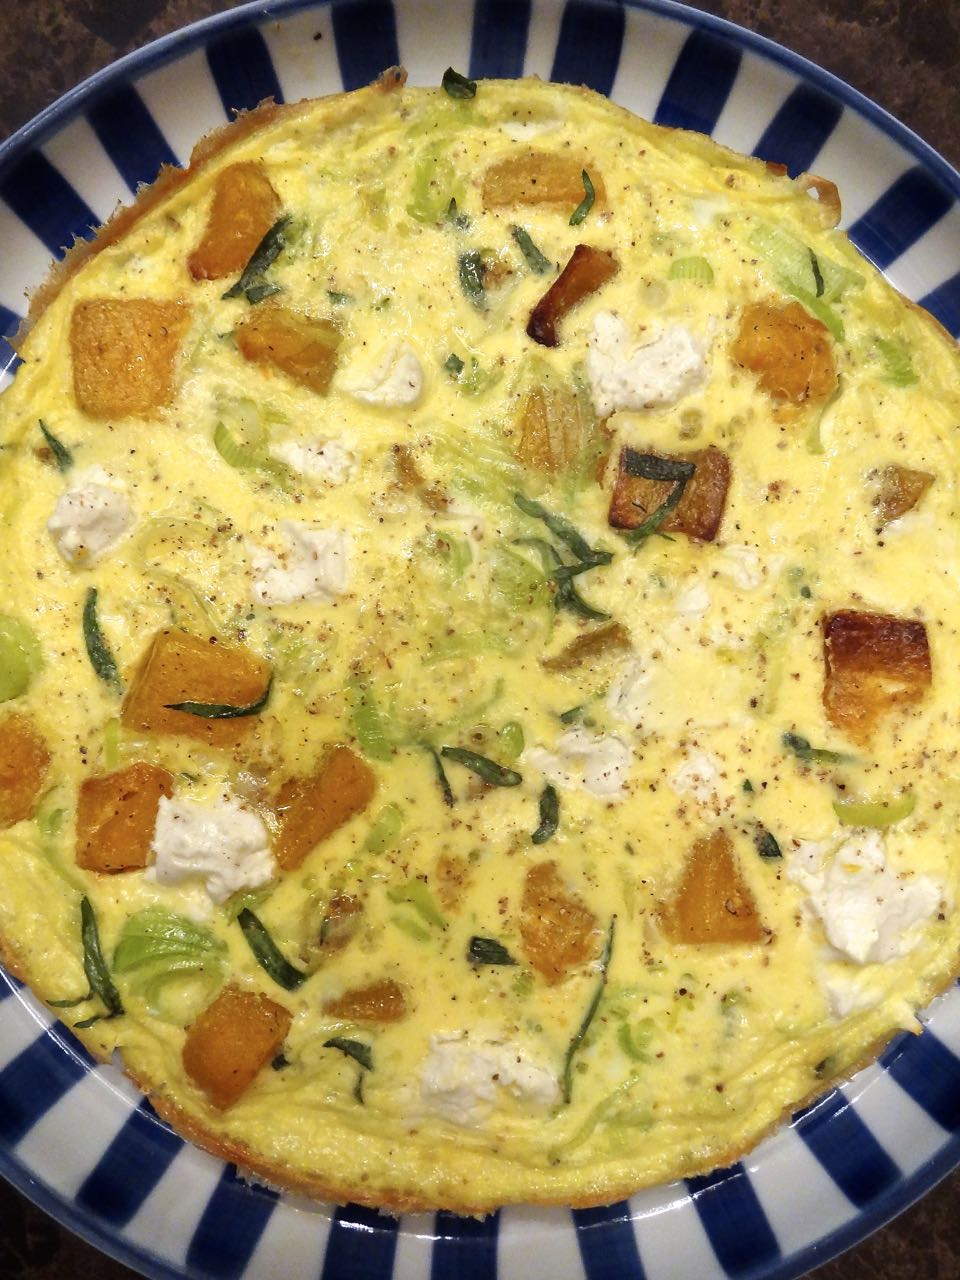 Scrumpdillyicious: Leek, Squash & Goat Cheese Frittata with Tarragon